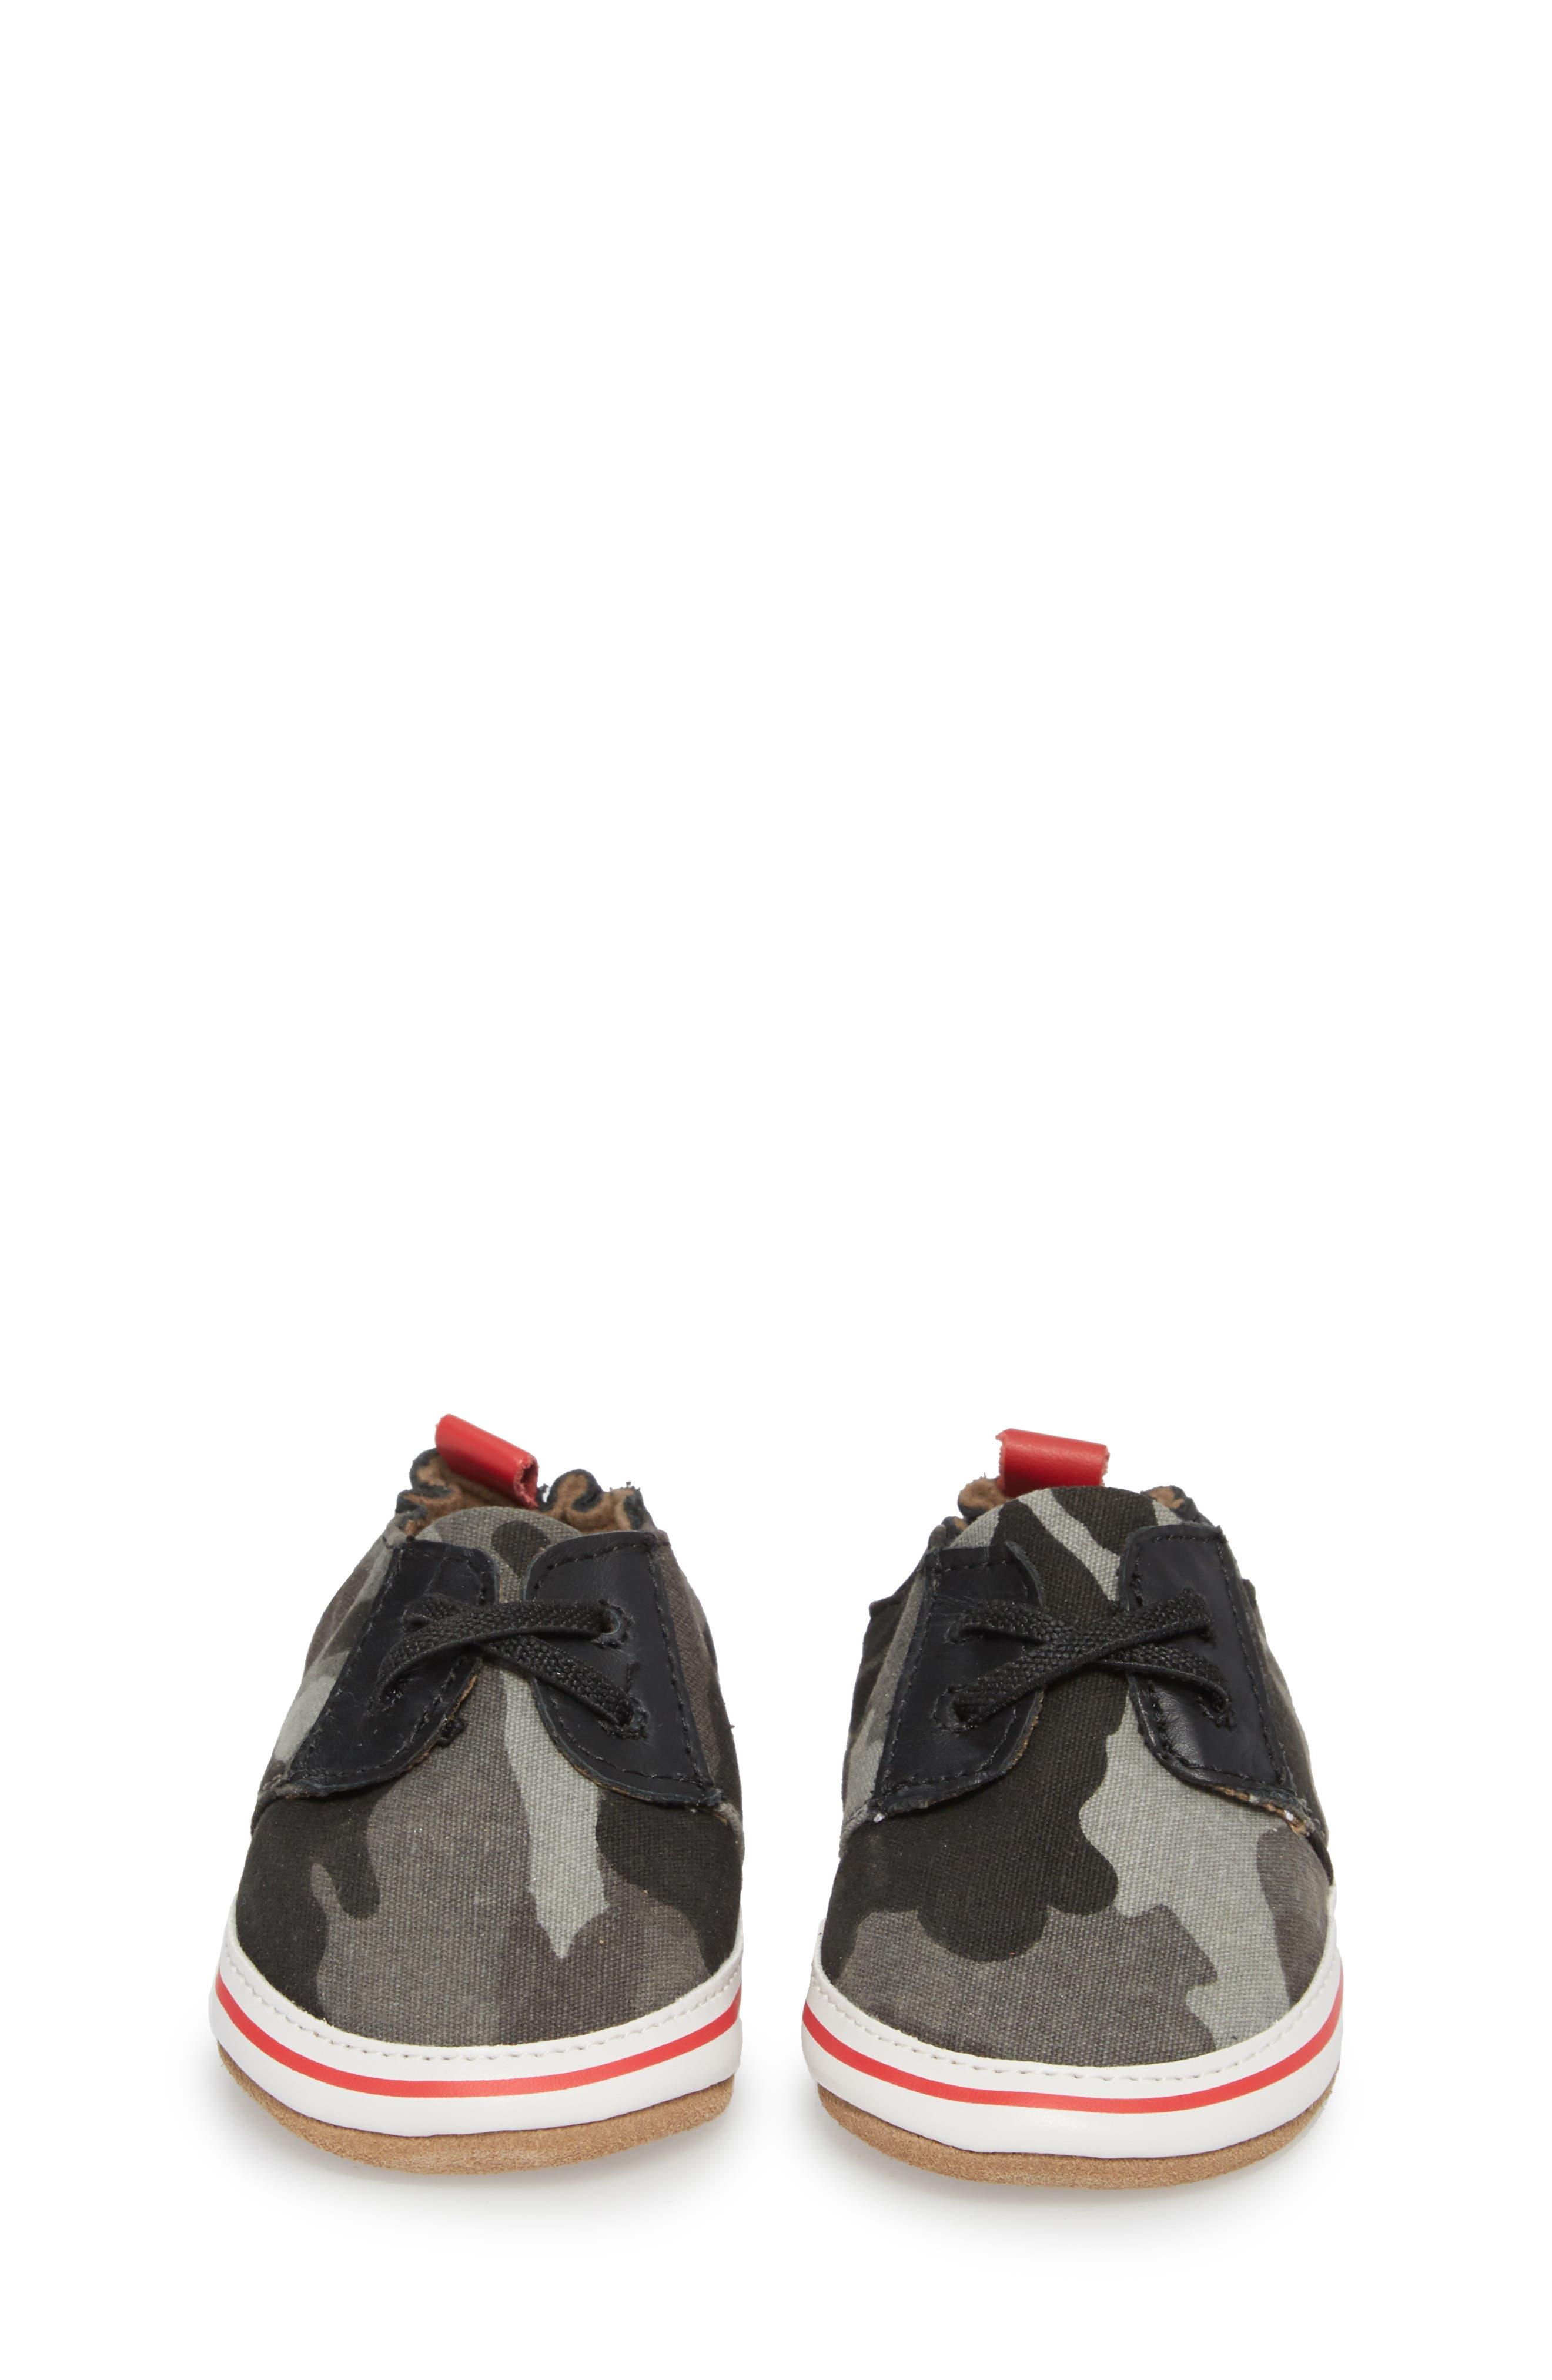 Cool & Casual Camo Print Crib Shoe,                             Alternate thumbnail 4, color,                             020